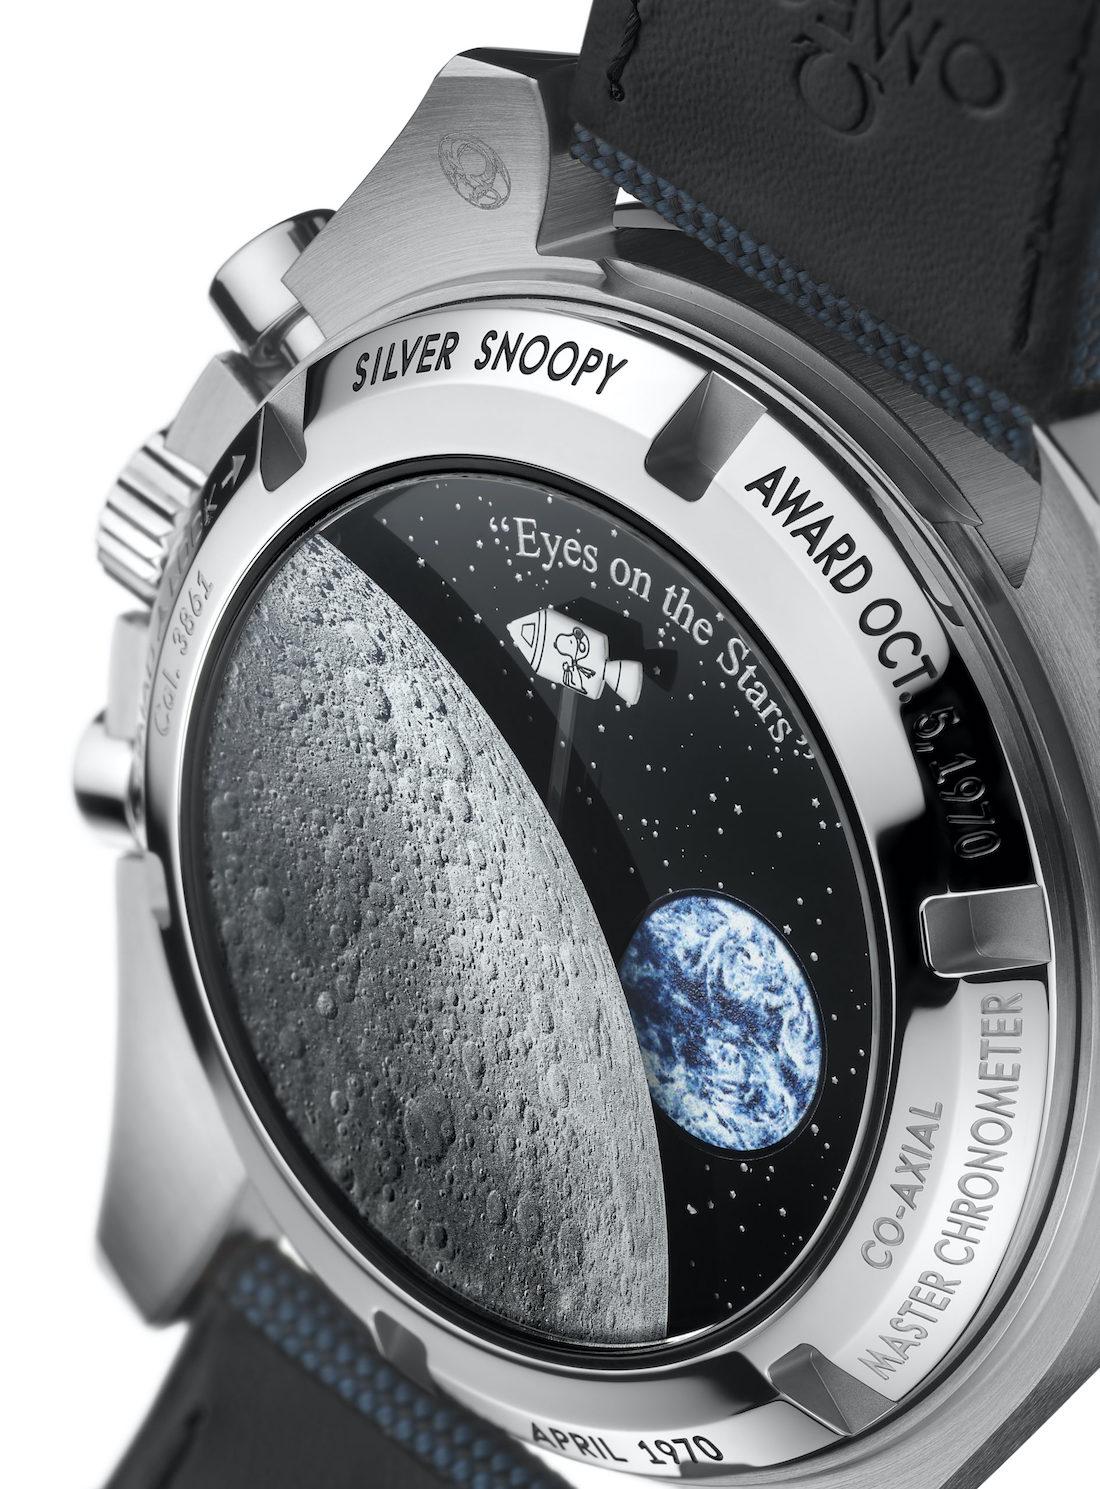 Omega Speedmaster Silver Snoopy Award 50th Anniversary 310.32.42.50.02.001 - 4